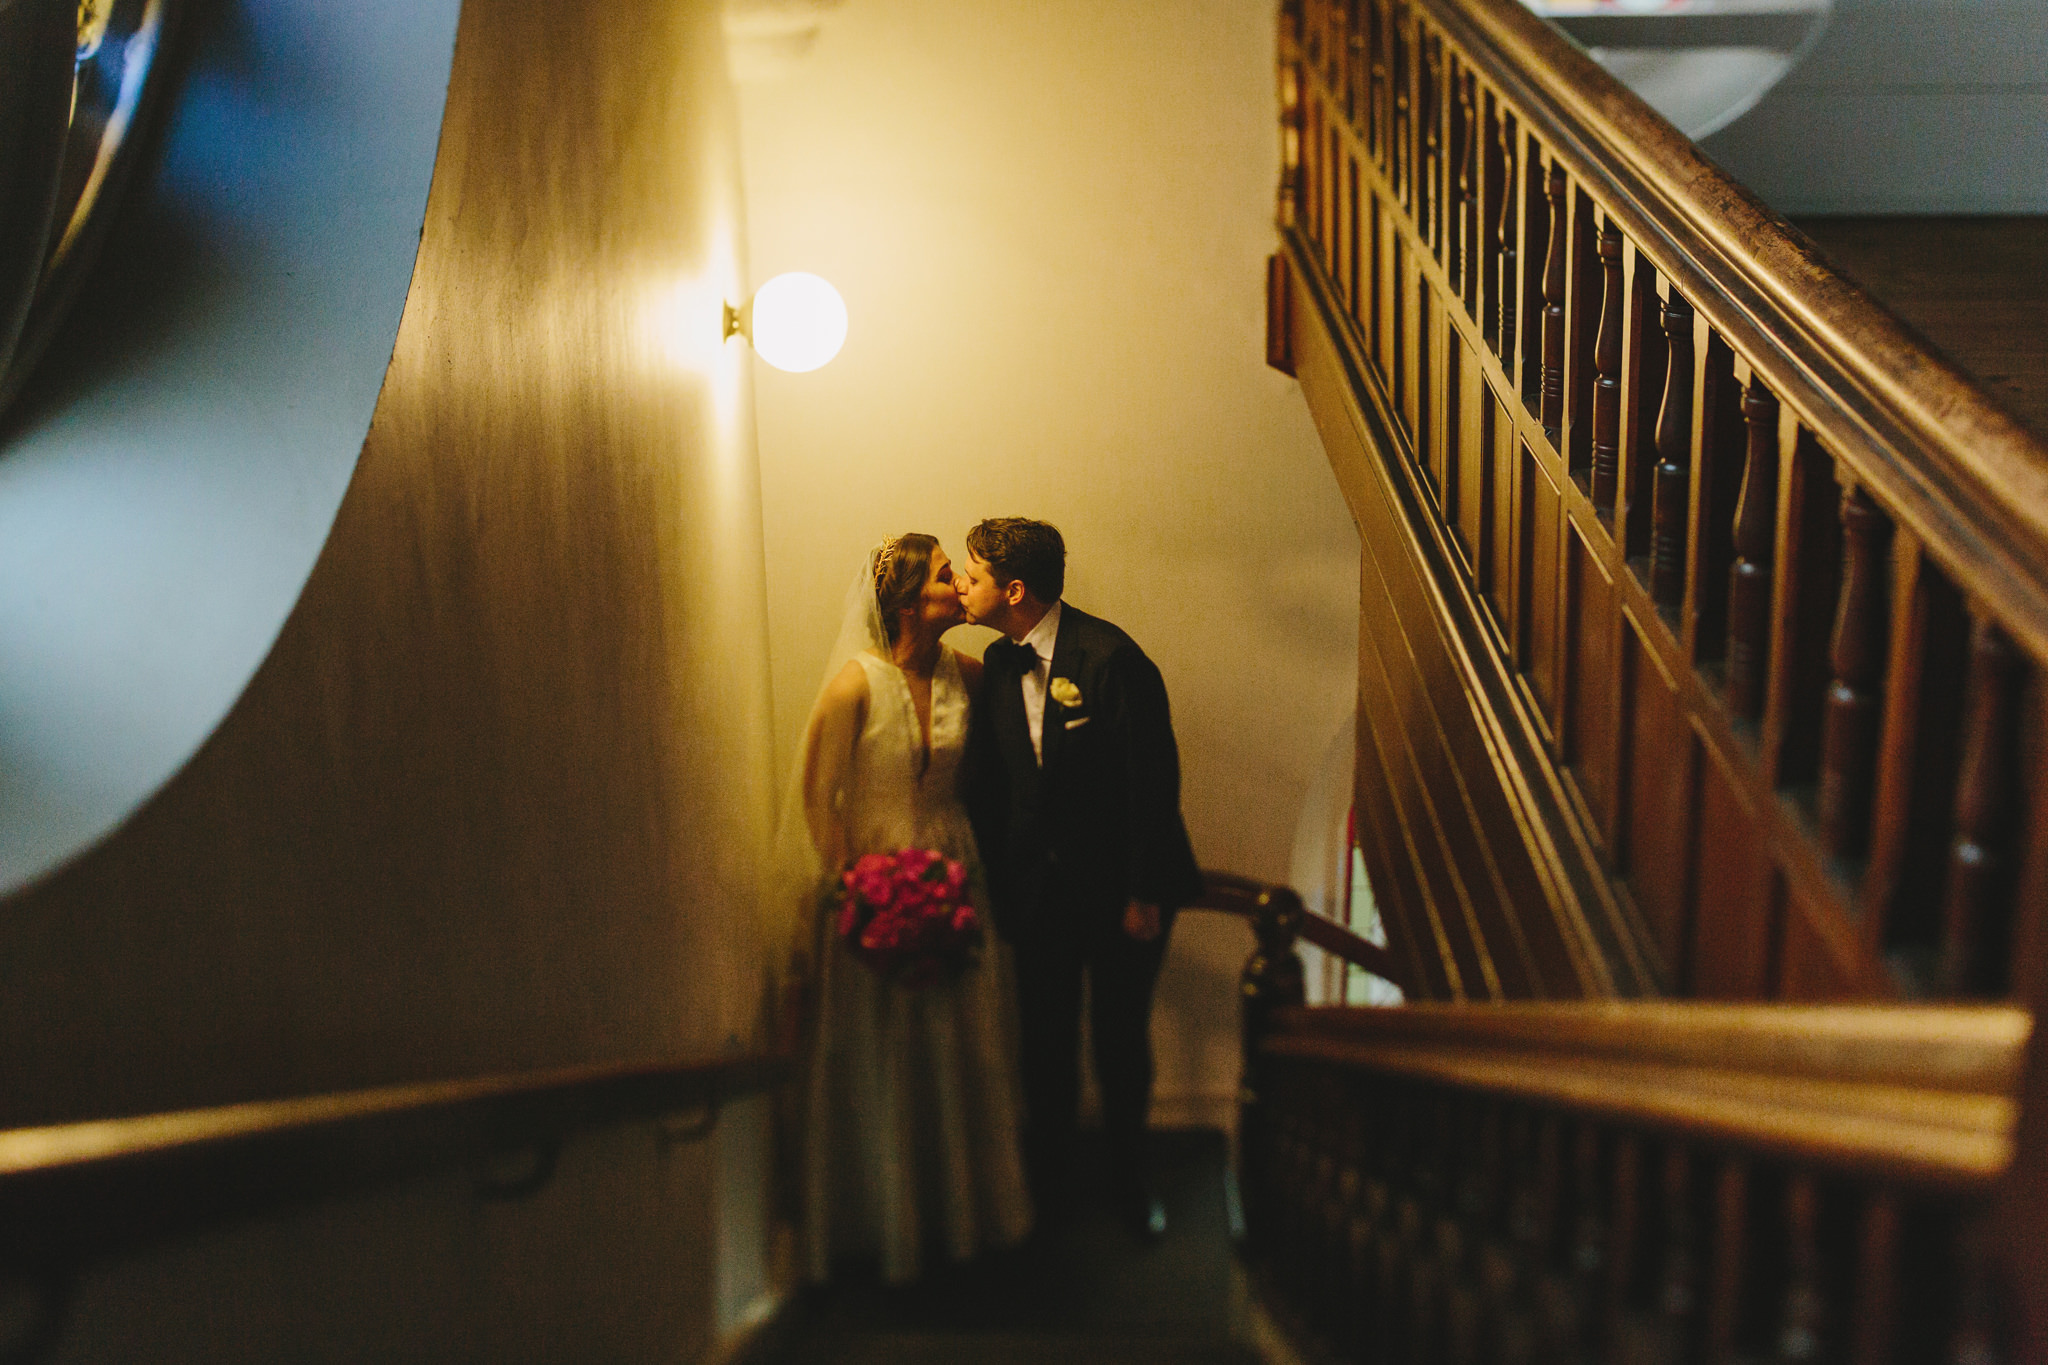 Abbotsford_Convent_Wedding_Peter_Anna076.JPG